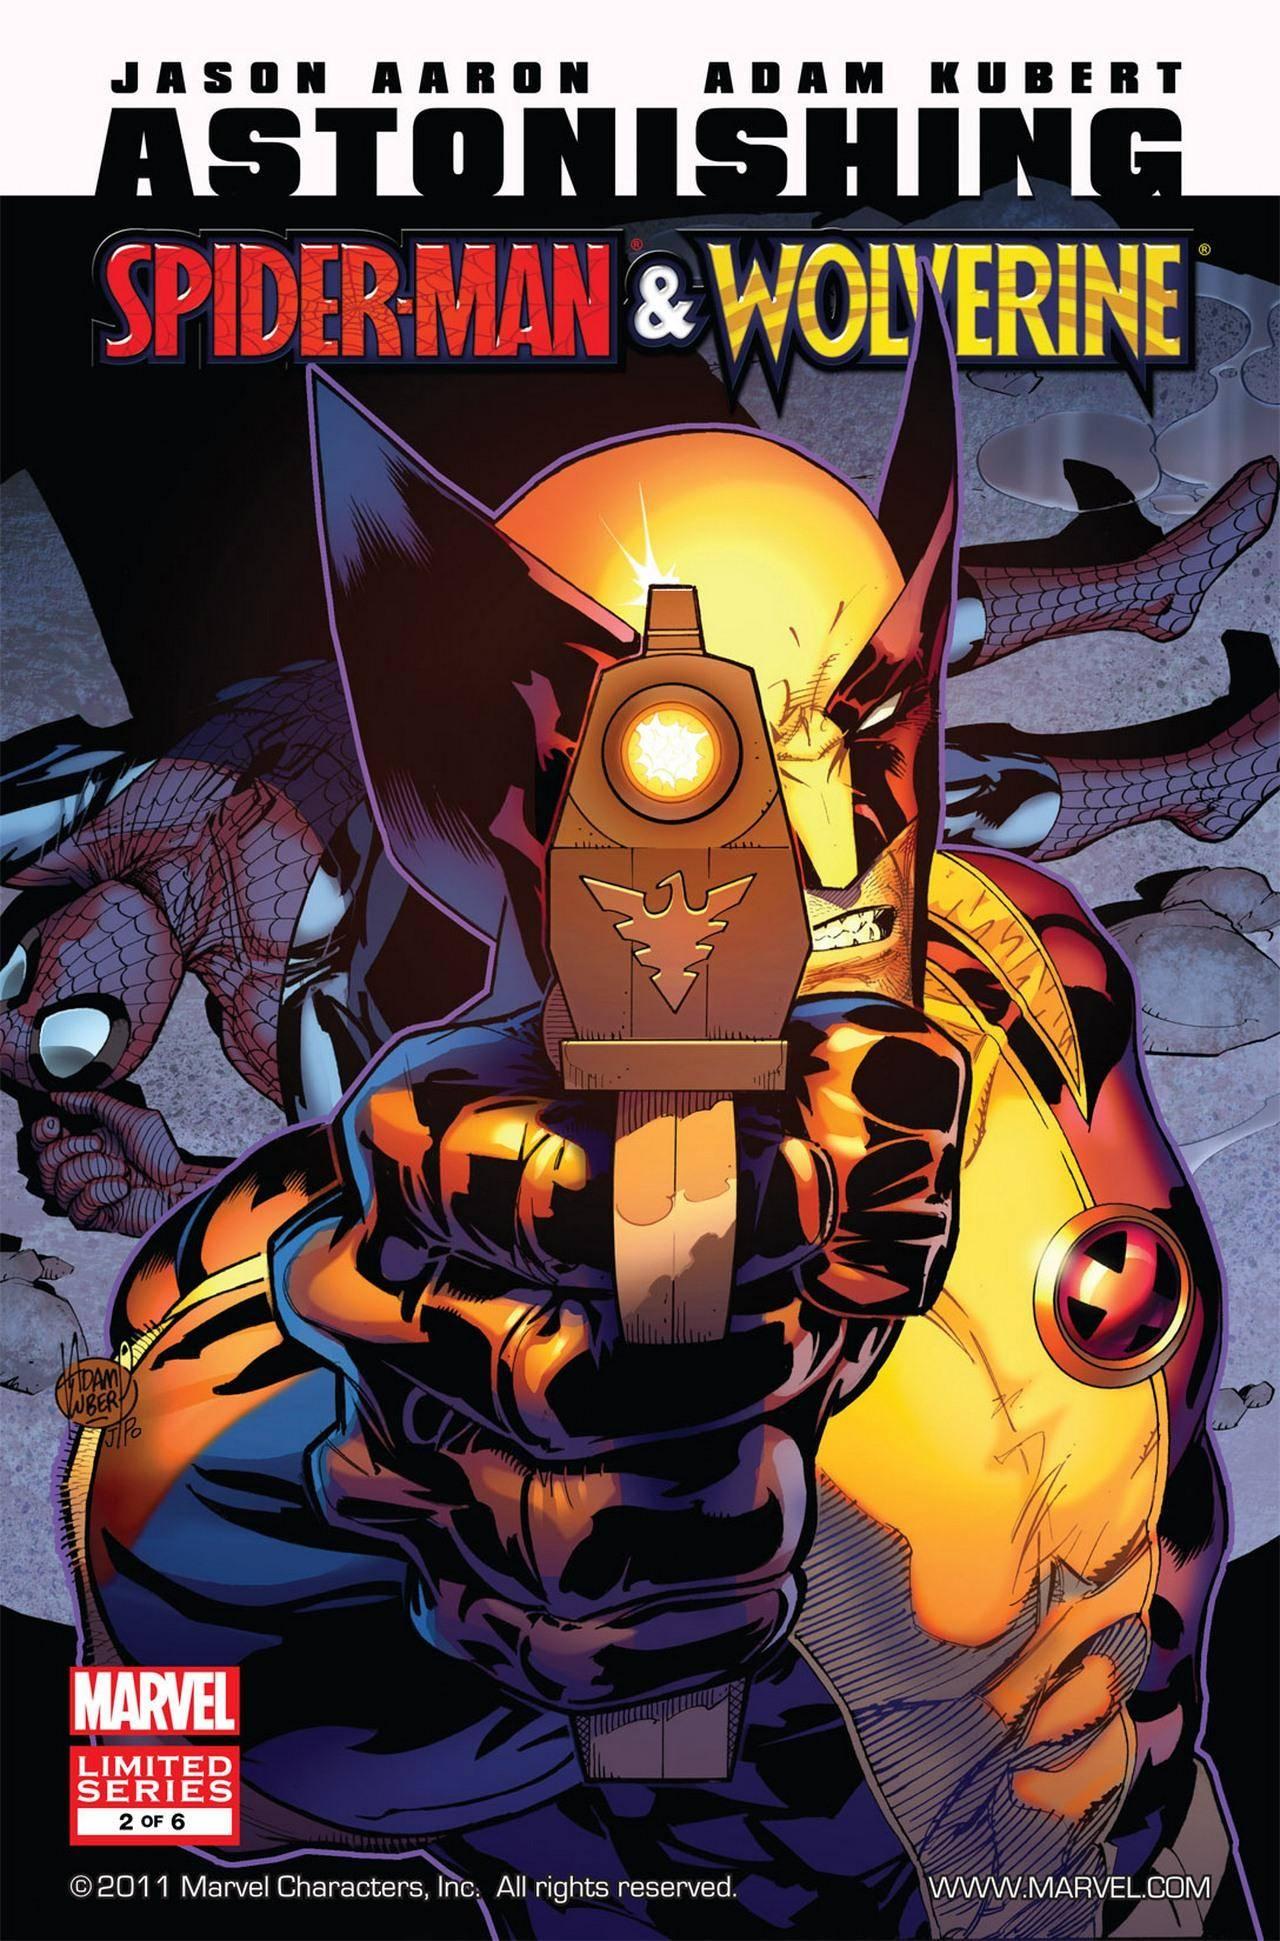 For PostalPops Astonishing Spider-Man  Wolverine 02 of 6 cbr